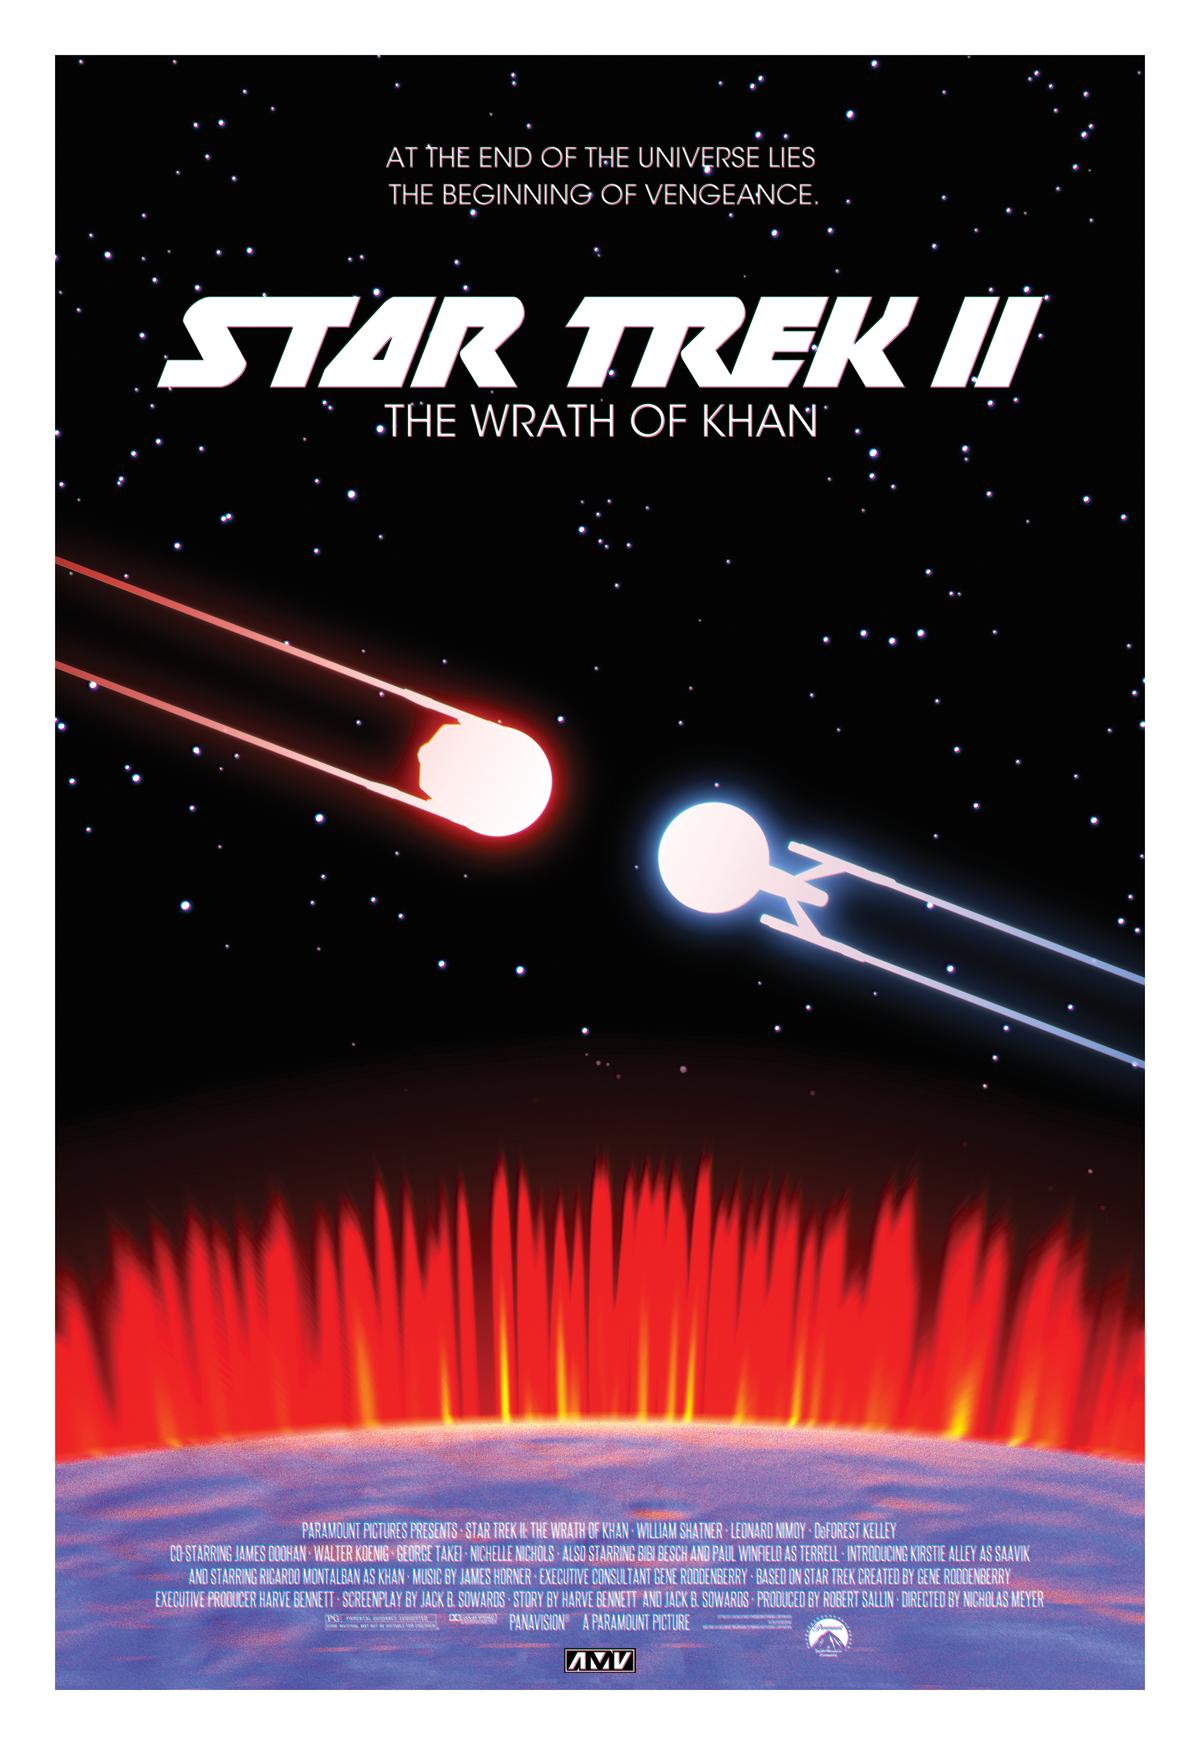 star trek ii the wrath of khan poster by abelmvada on